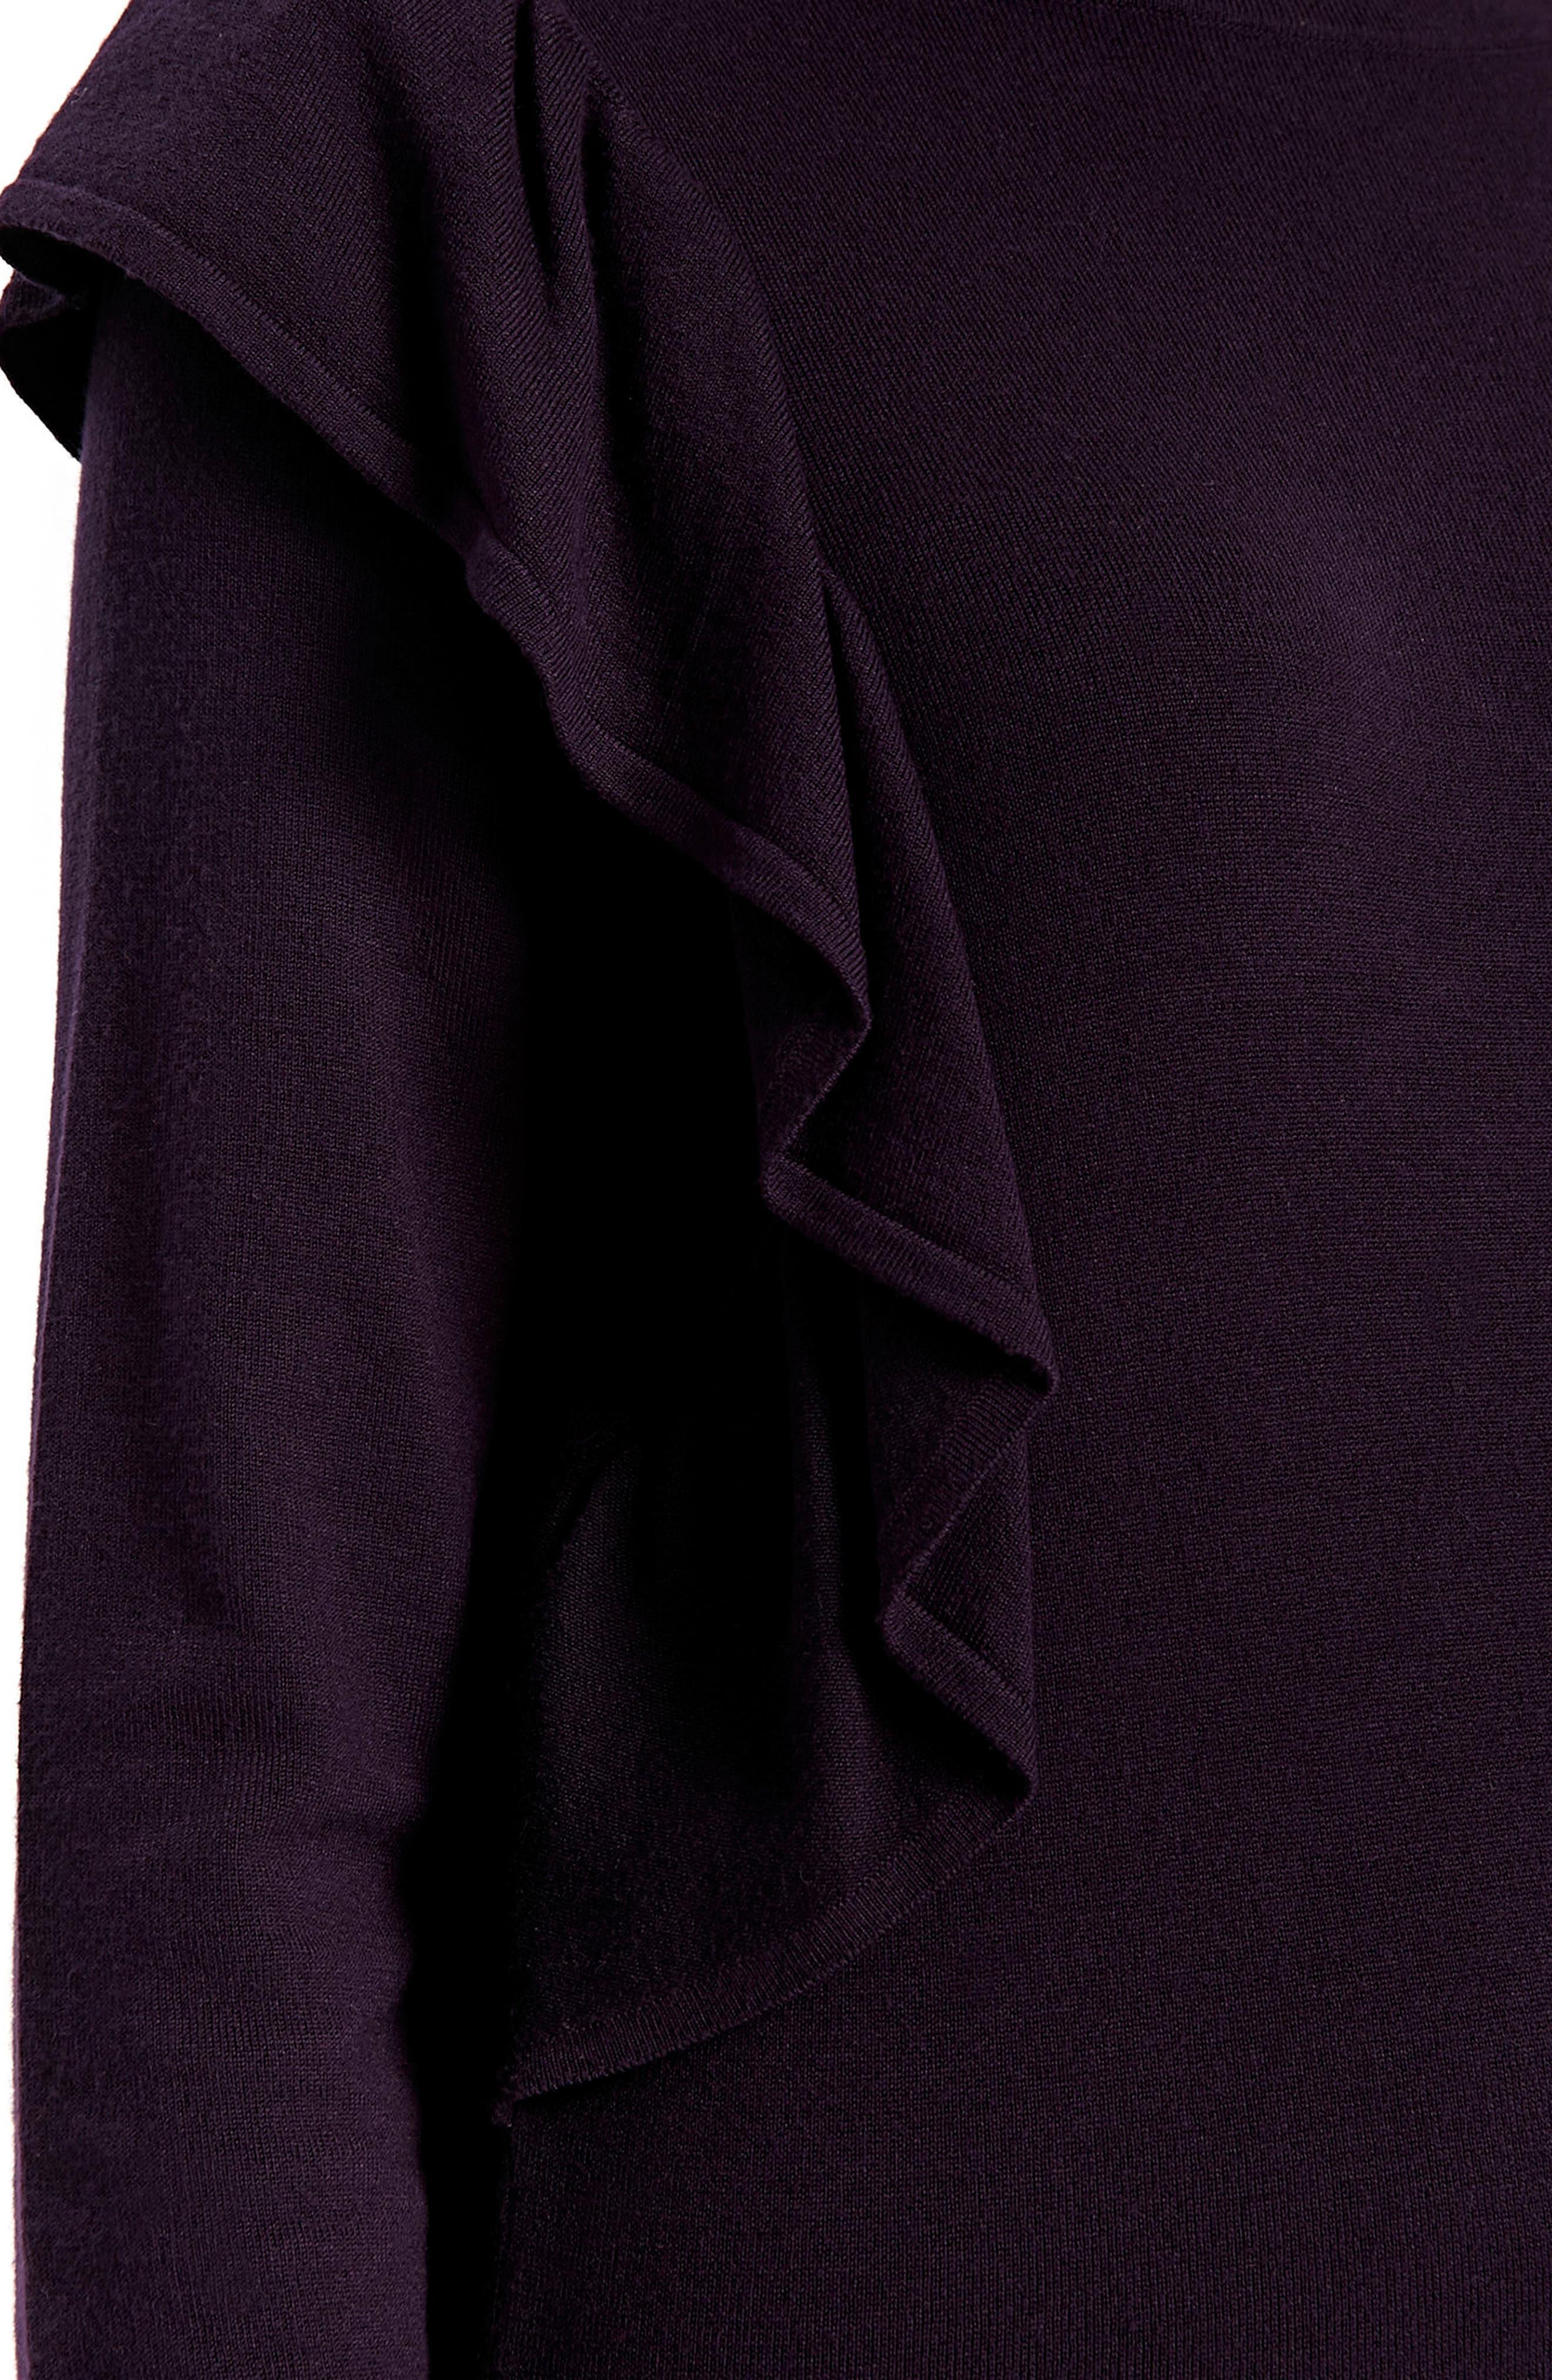 Long Sleeve Ruffle Shoulder Pullover,                             Alternate thumbnail 6, color,